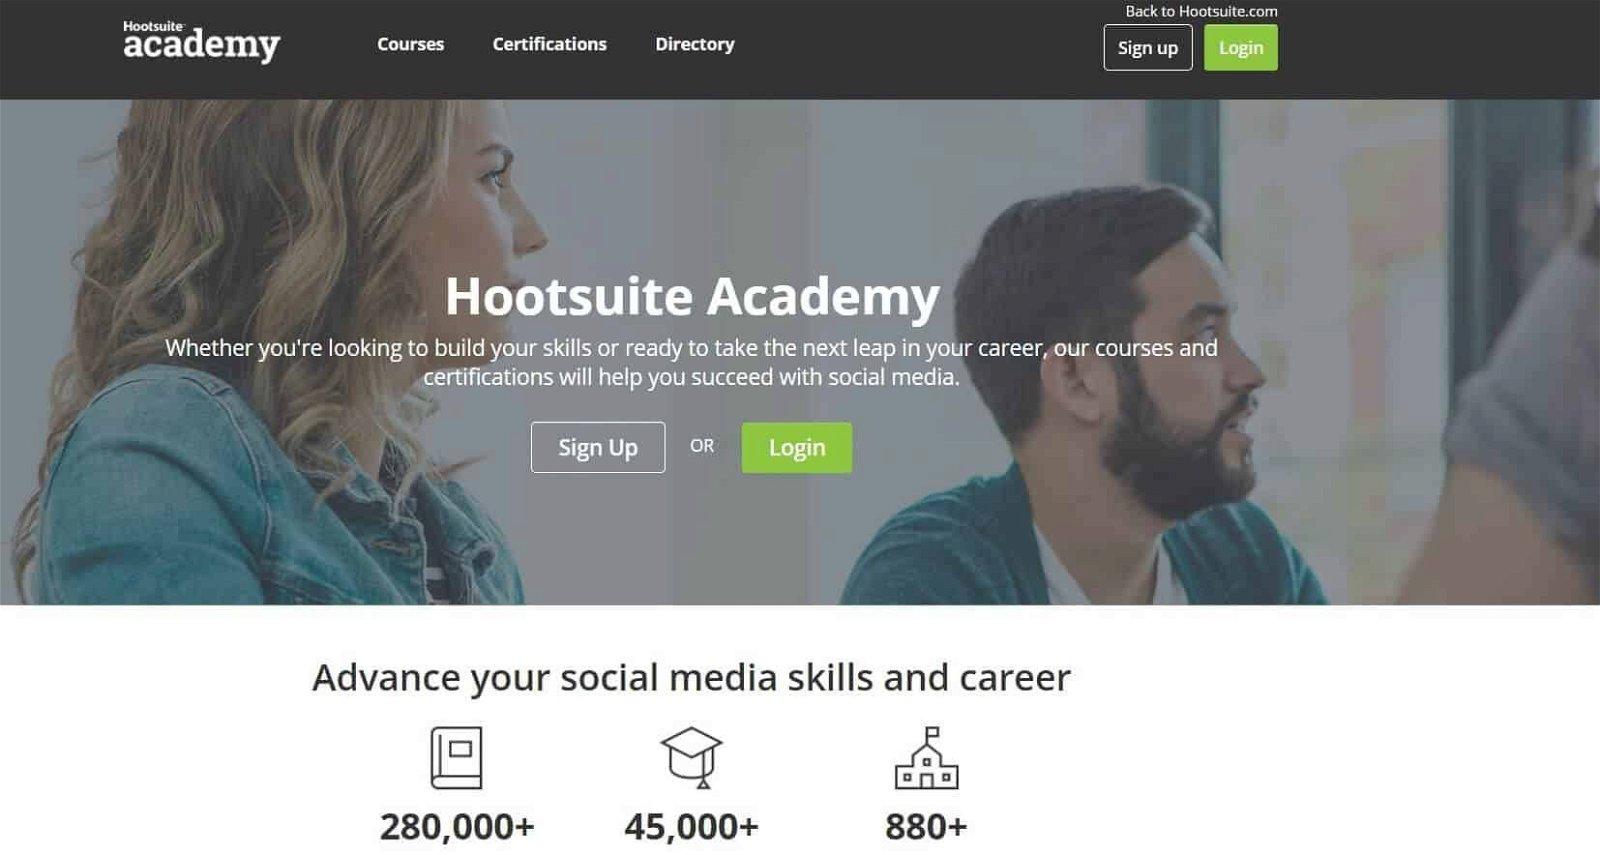 la homepage di hootsuite academy